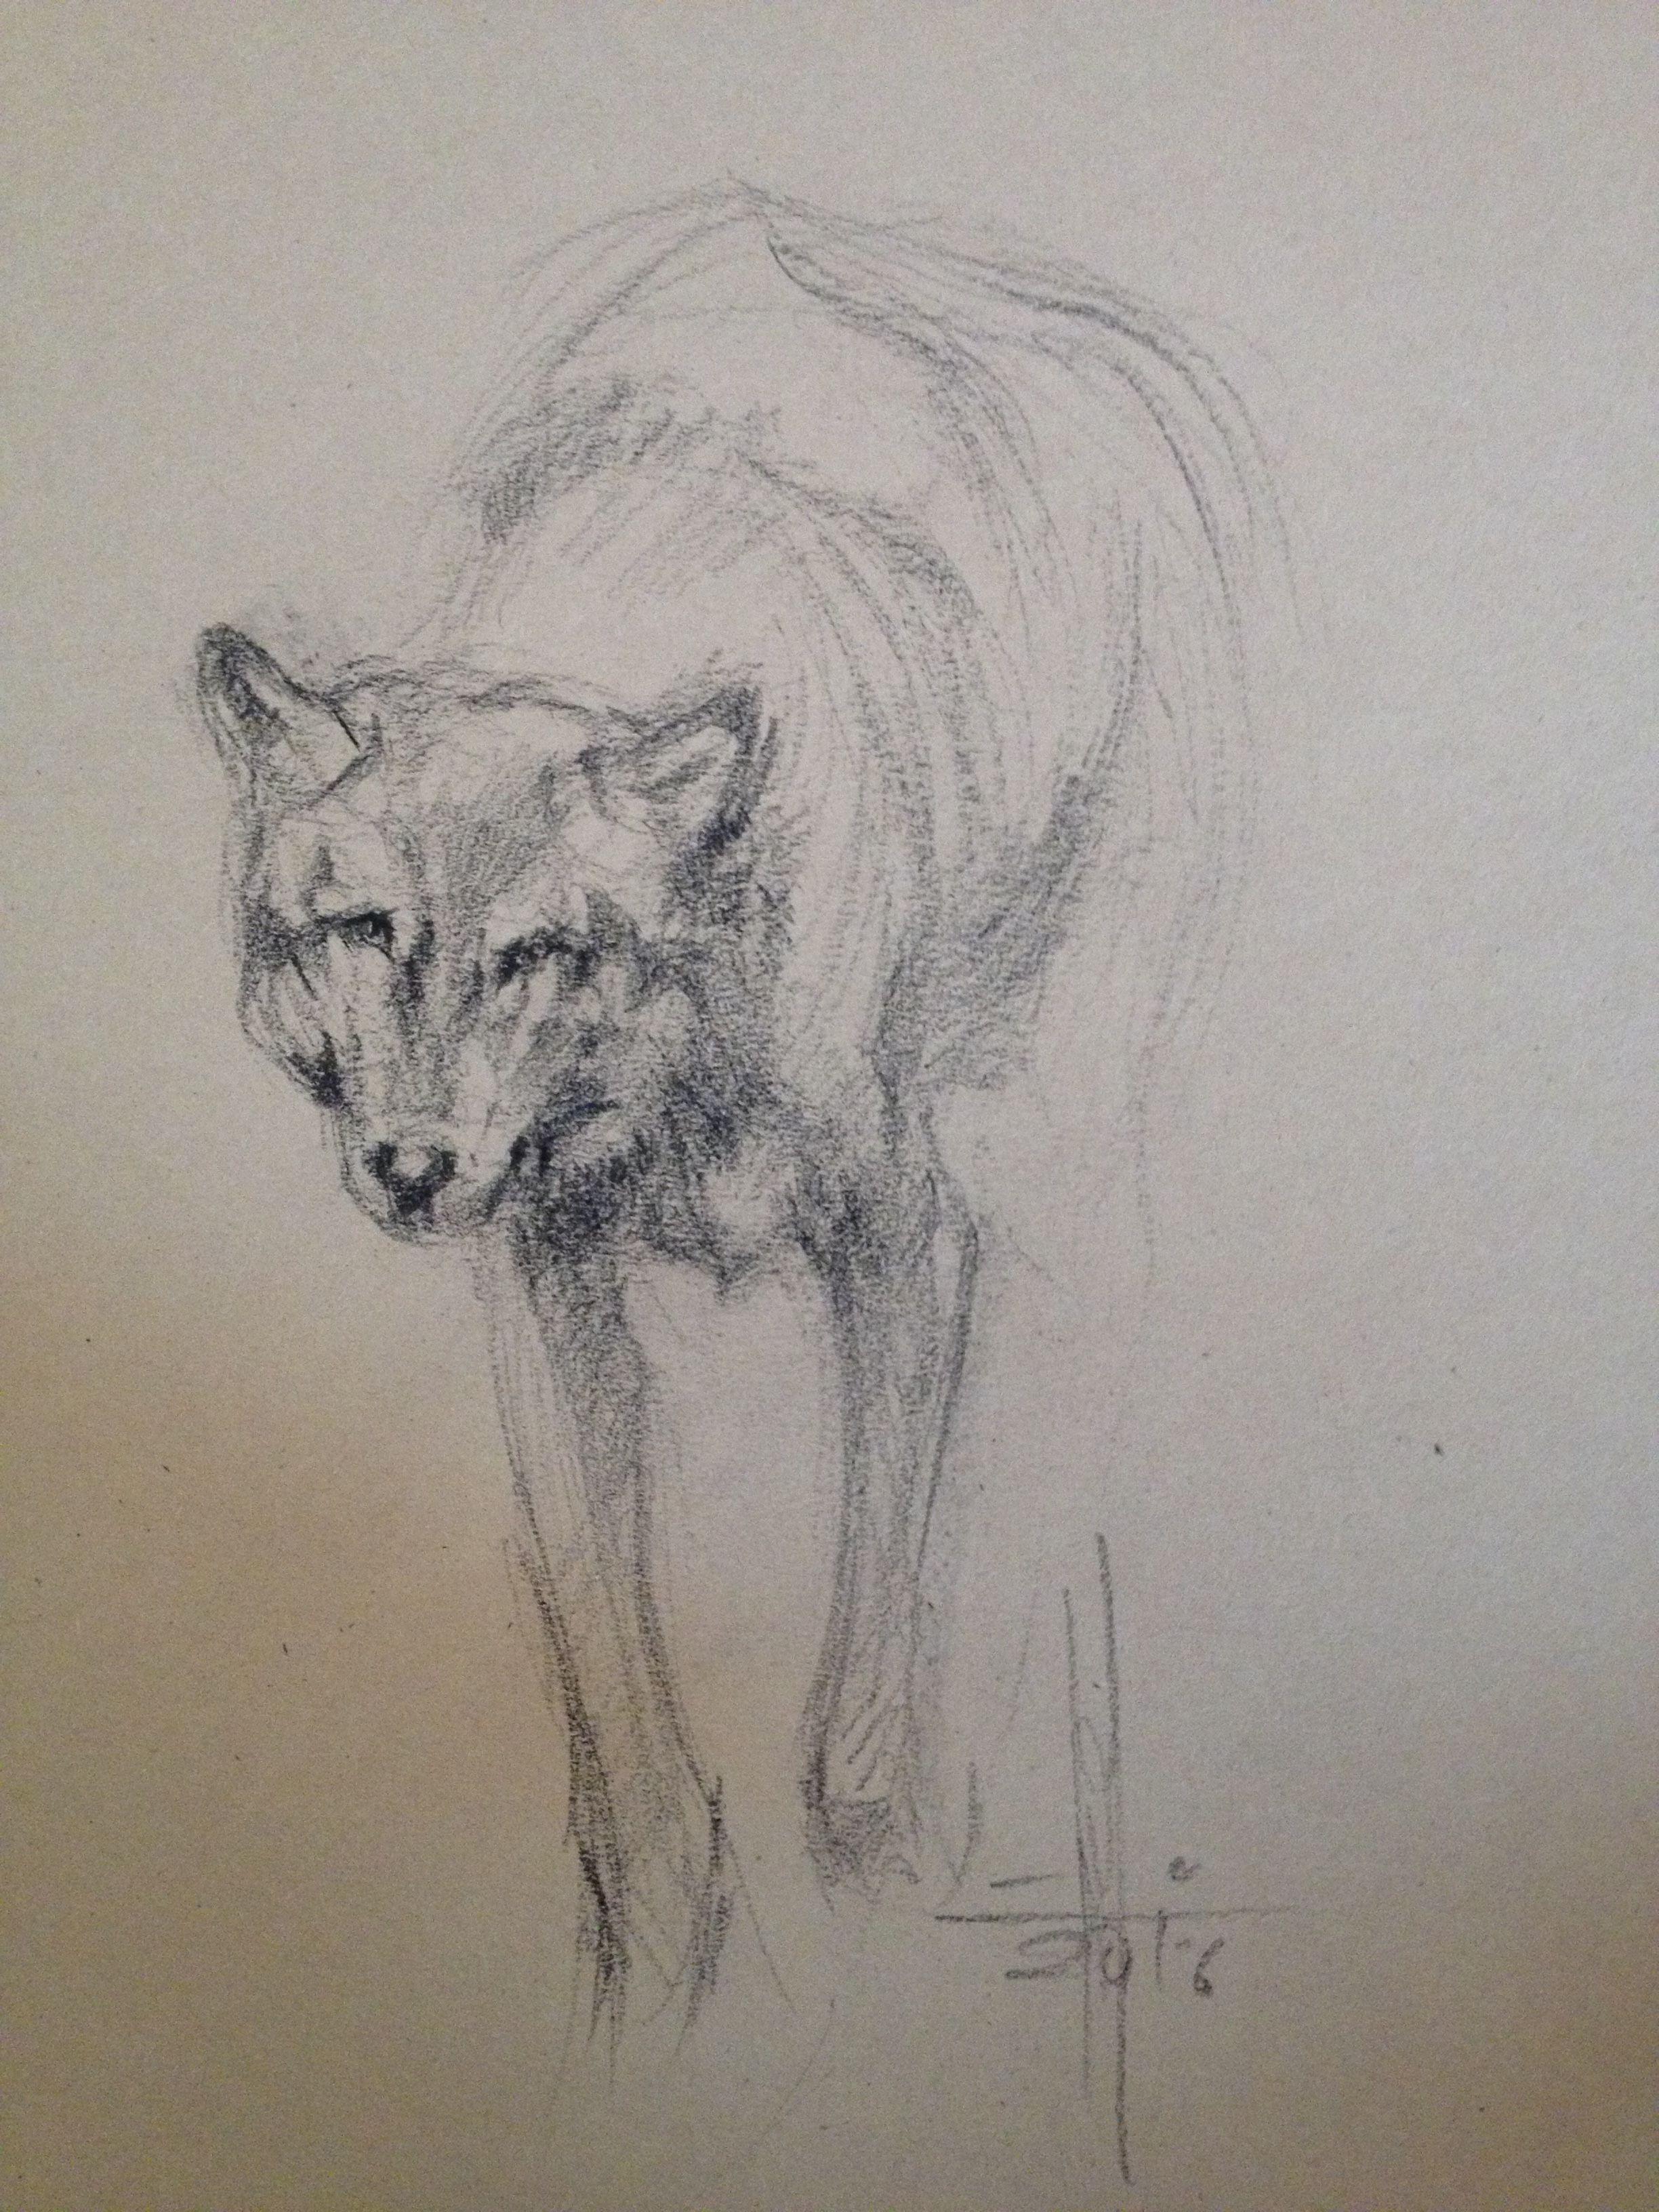 Resultado De Imagen Para Lobos Aullando Dibujos A Lapiz Jidiworkoutco